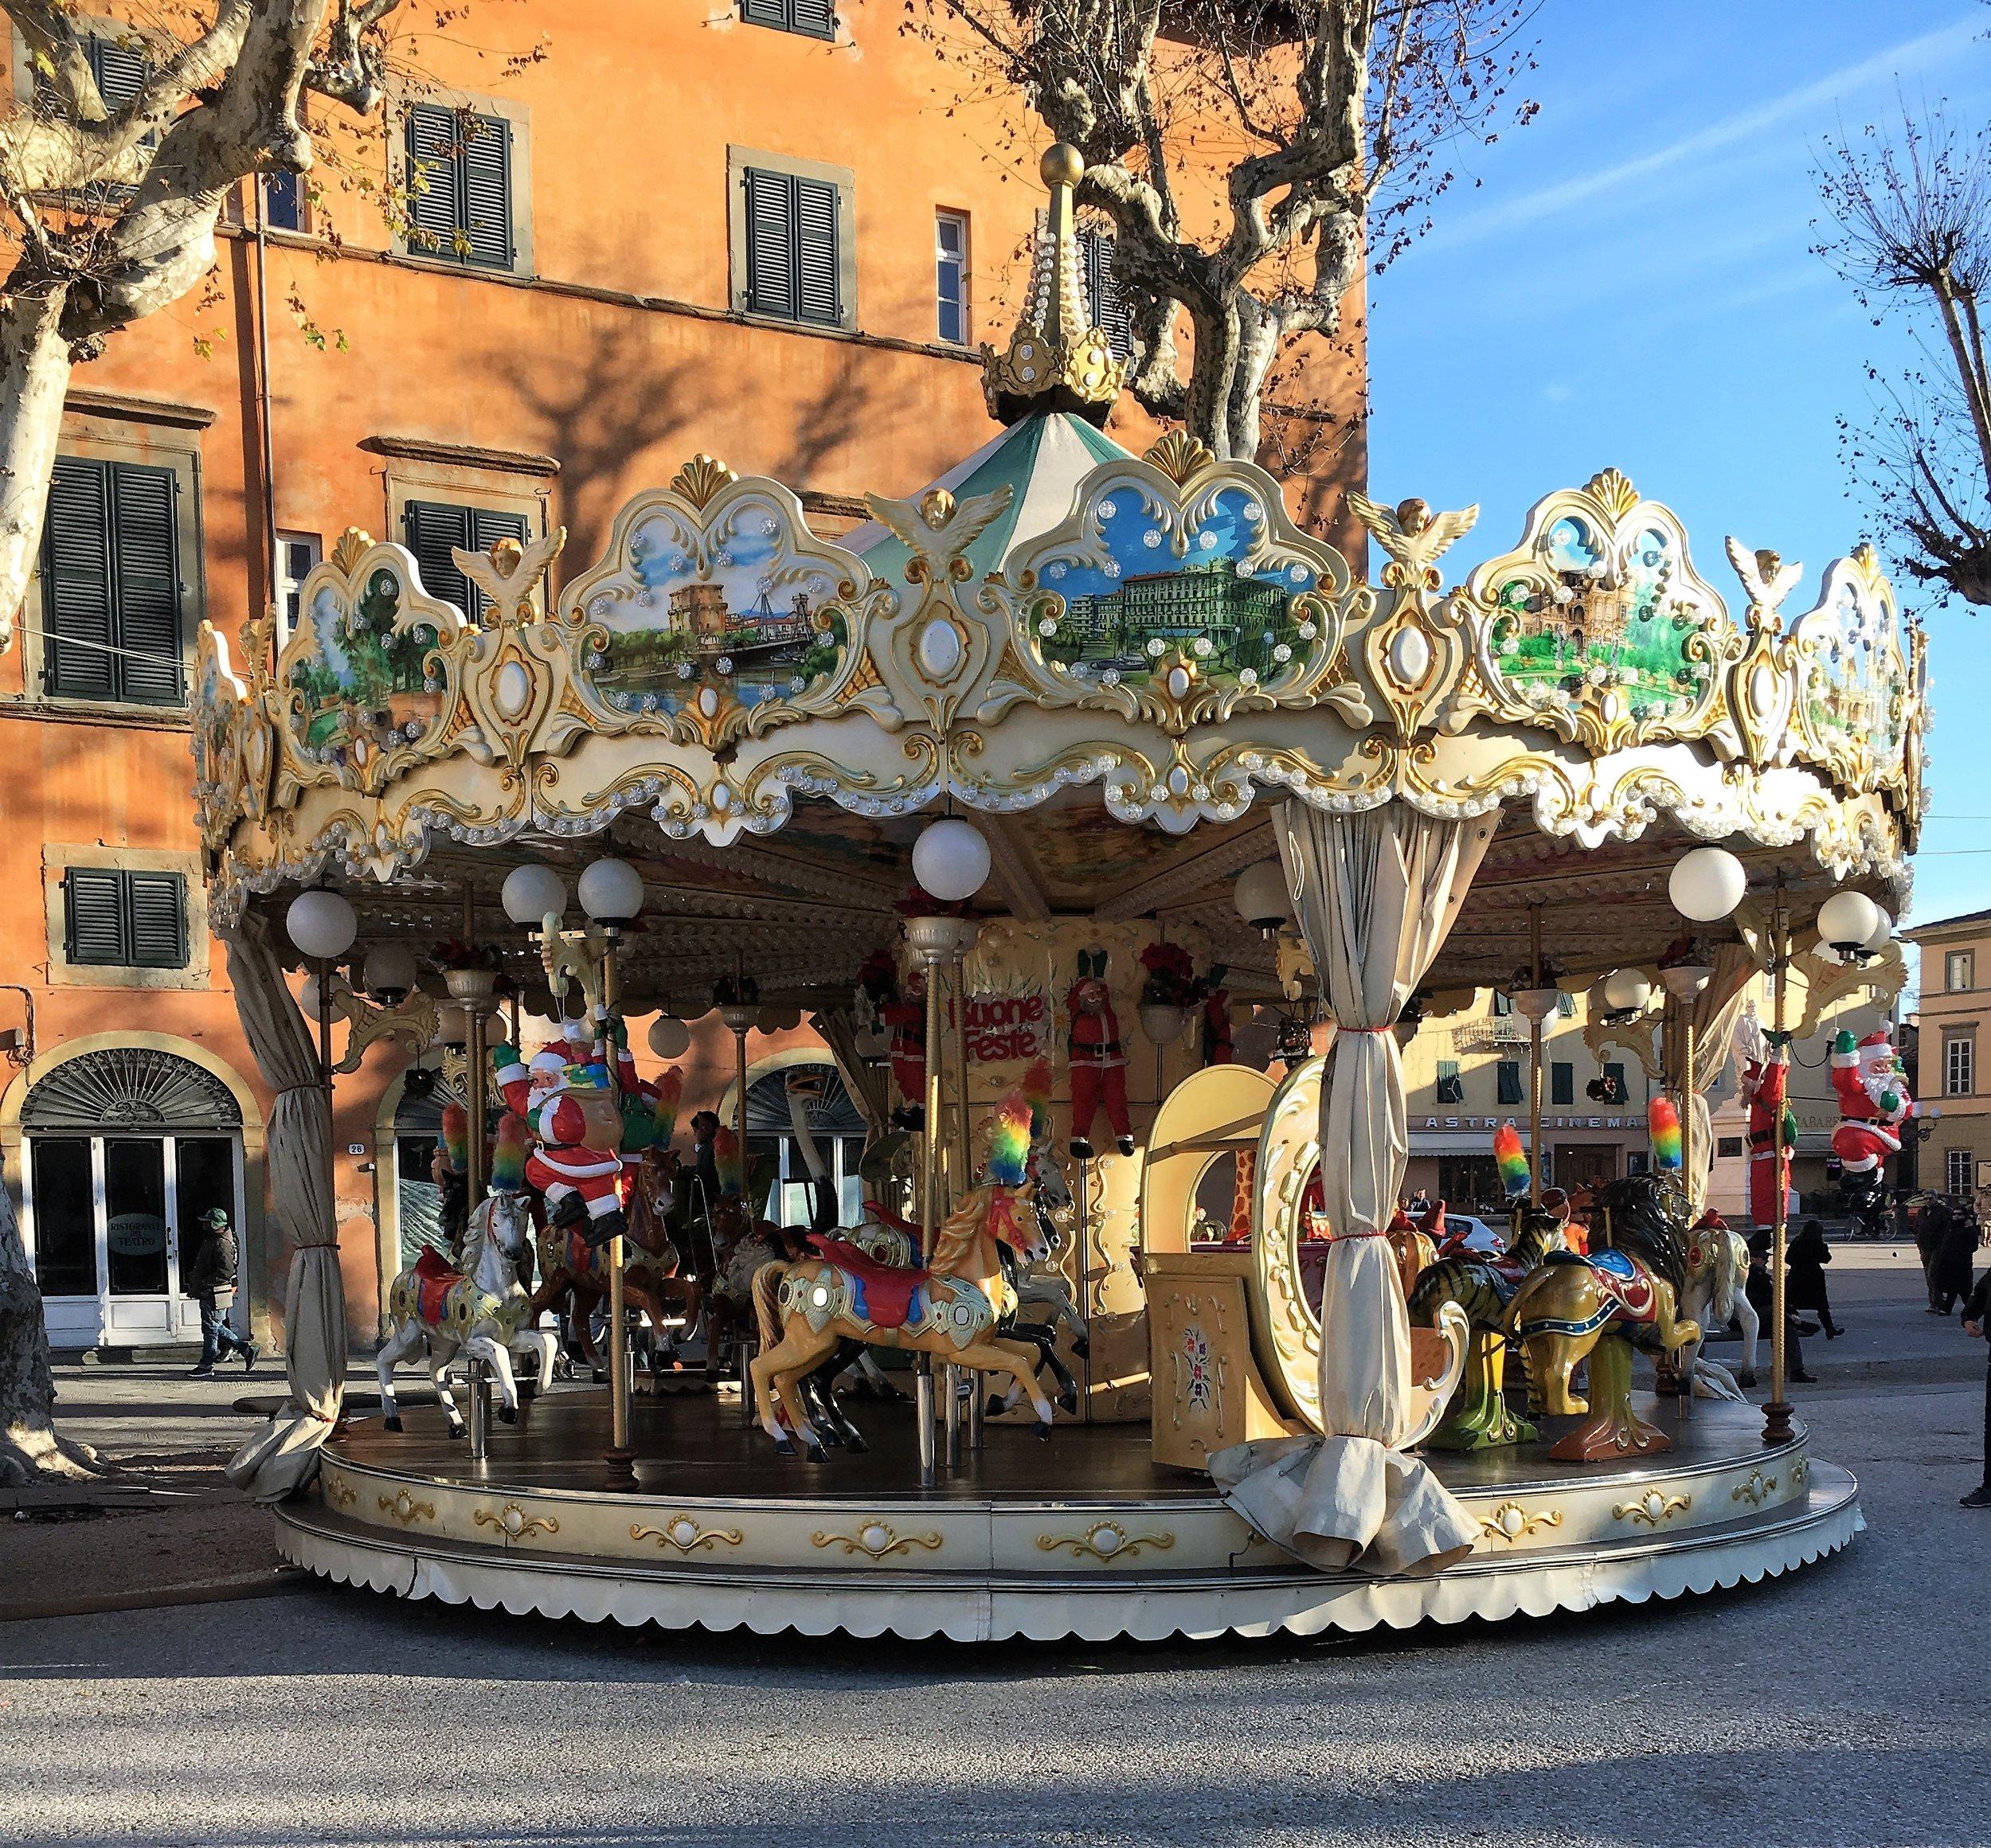 Carousel, Lucca, December 2016.